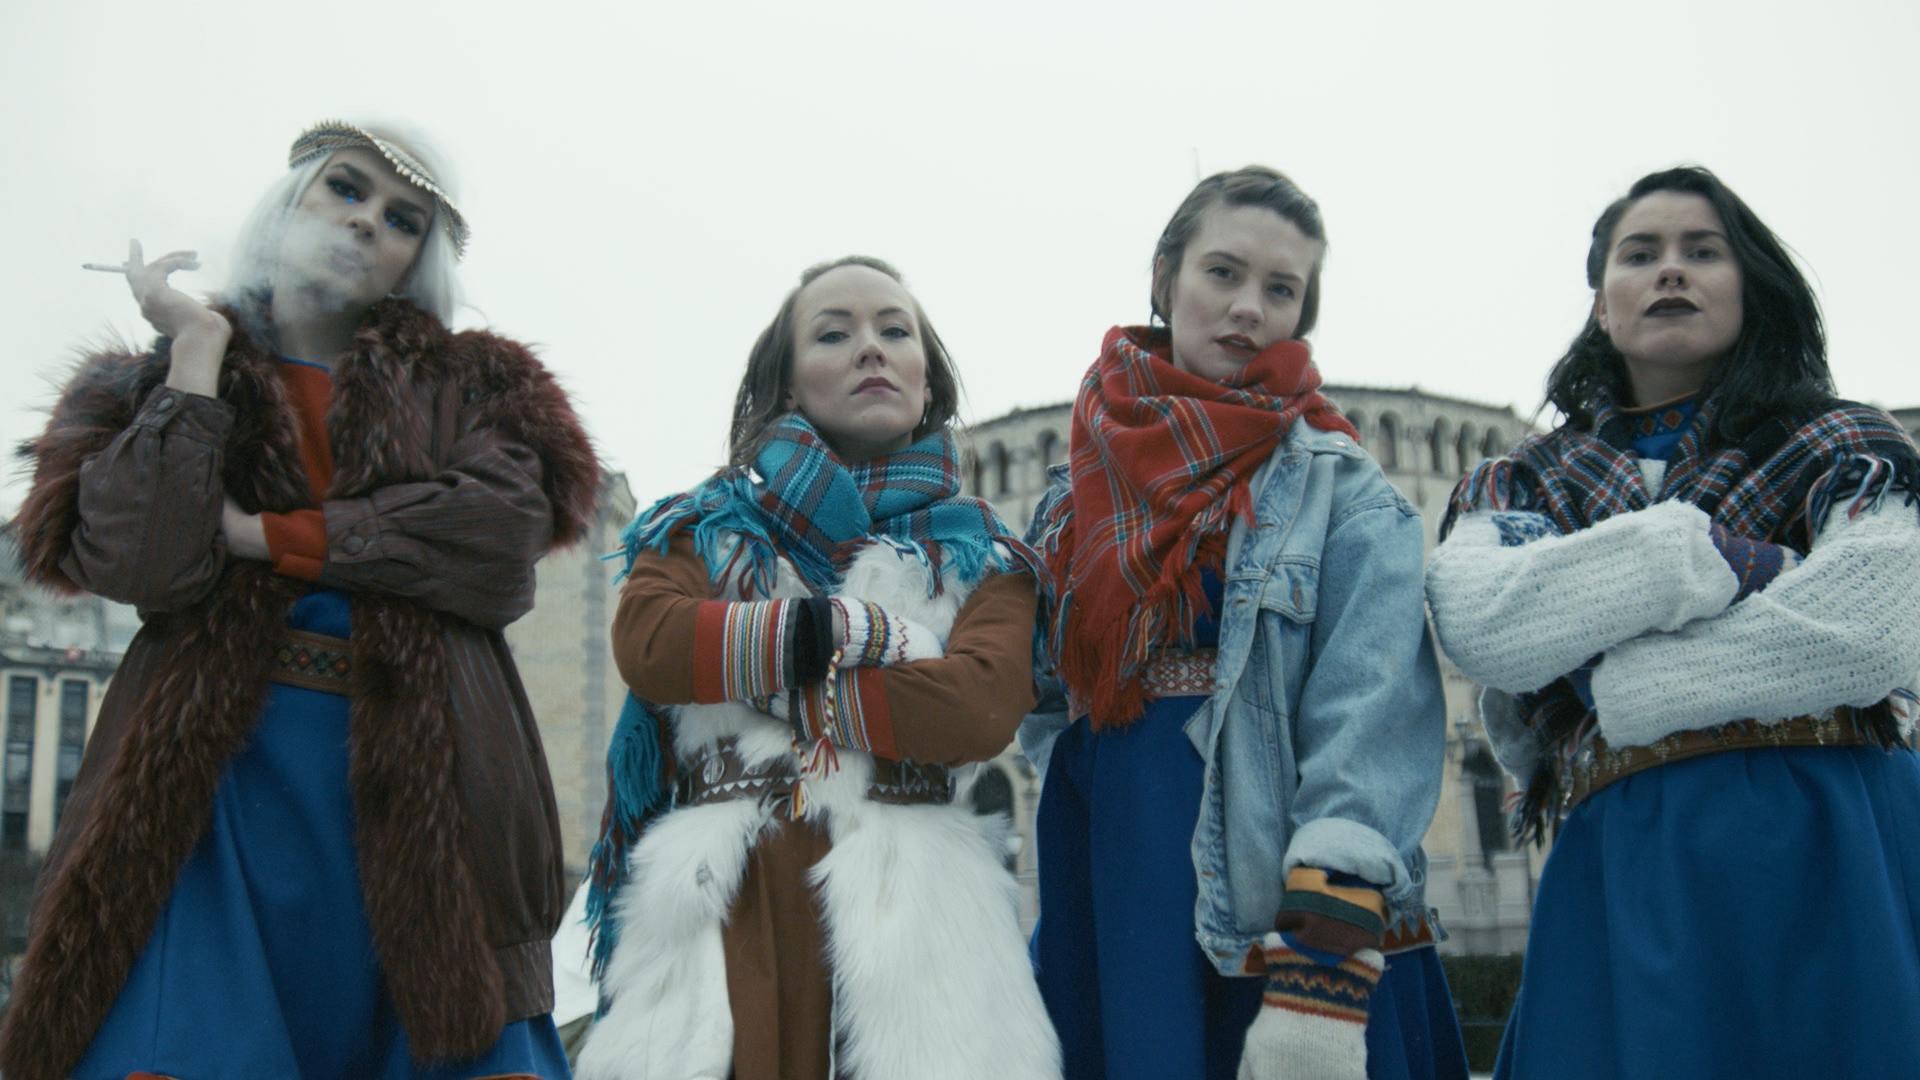 DON'T FUCK WITH ME - Short film. Director: Elle Márjá Eira. Photo: Ken Are Bongo. Sahkkon AS. 2019.